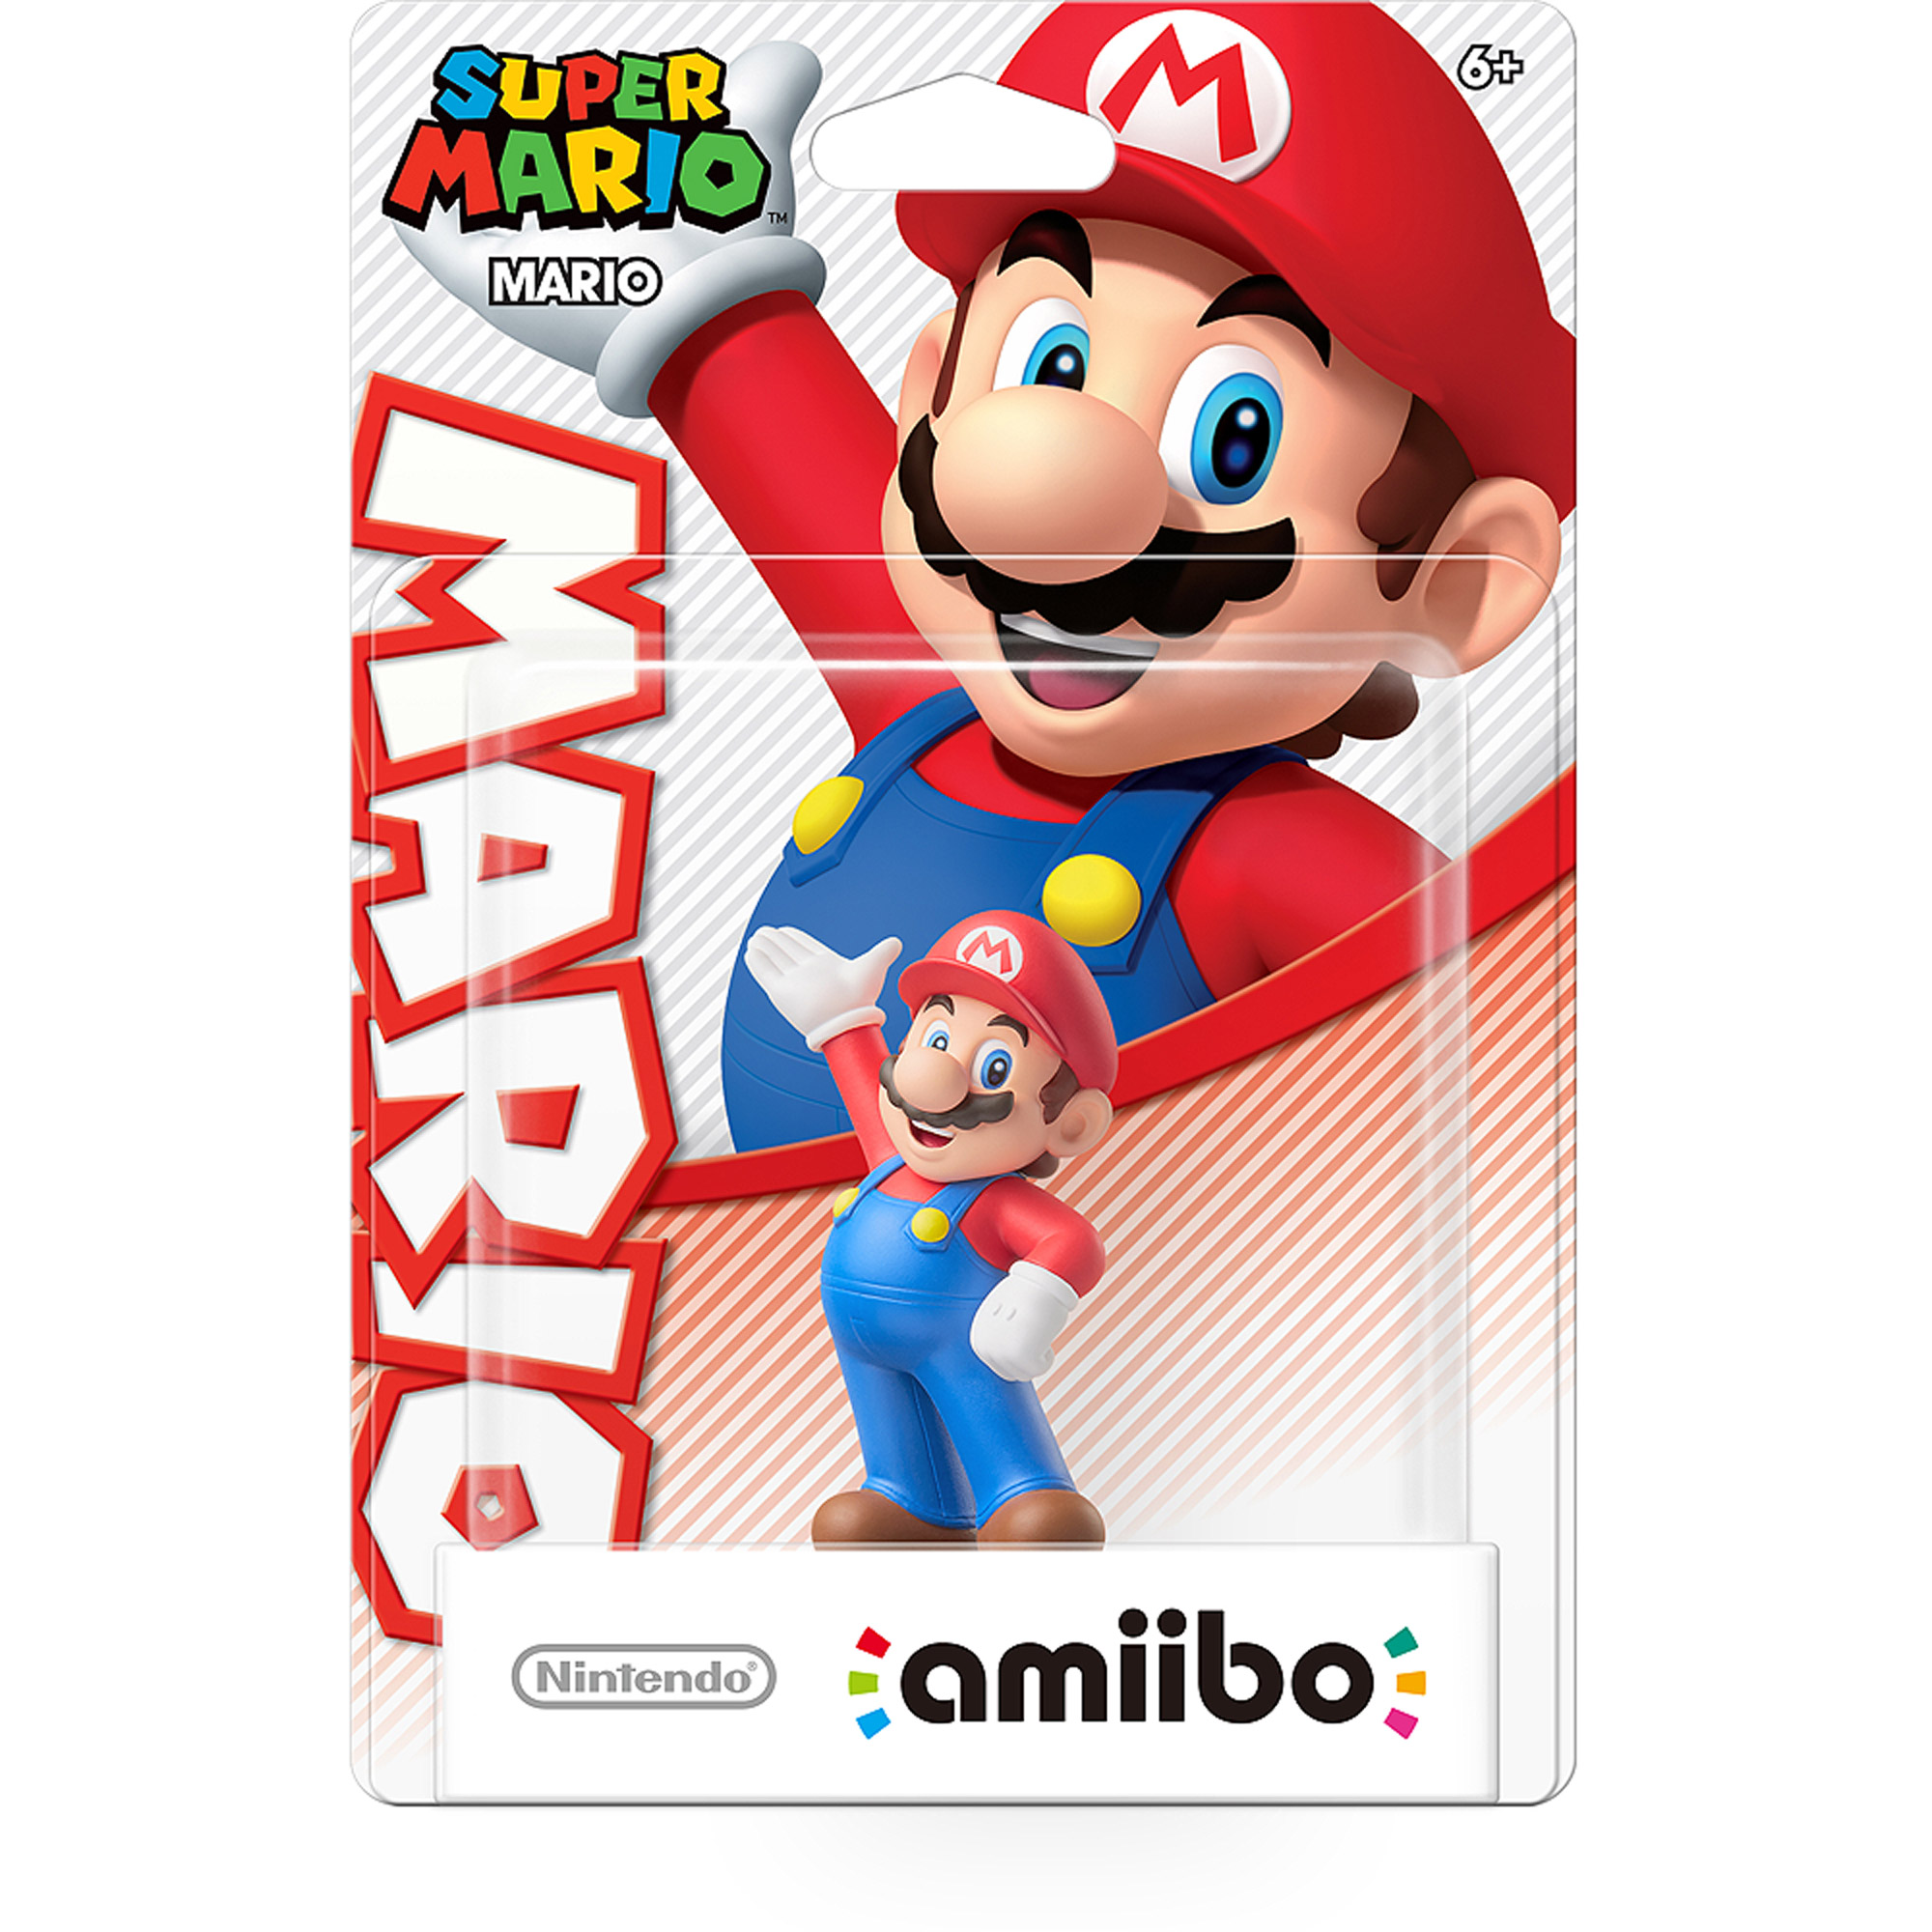 Mario Super Mario Series Amiibo (Nintendo Wii U or 3DS)